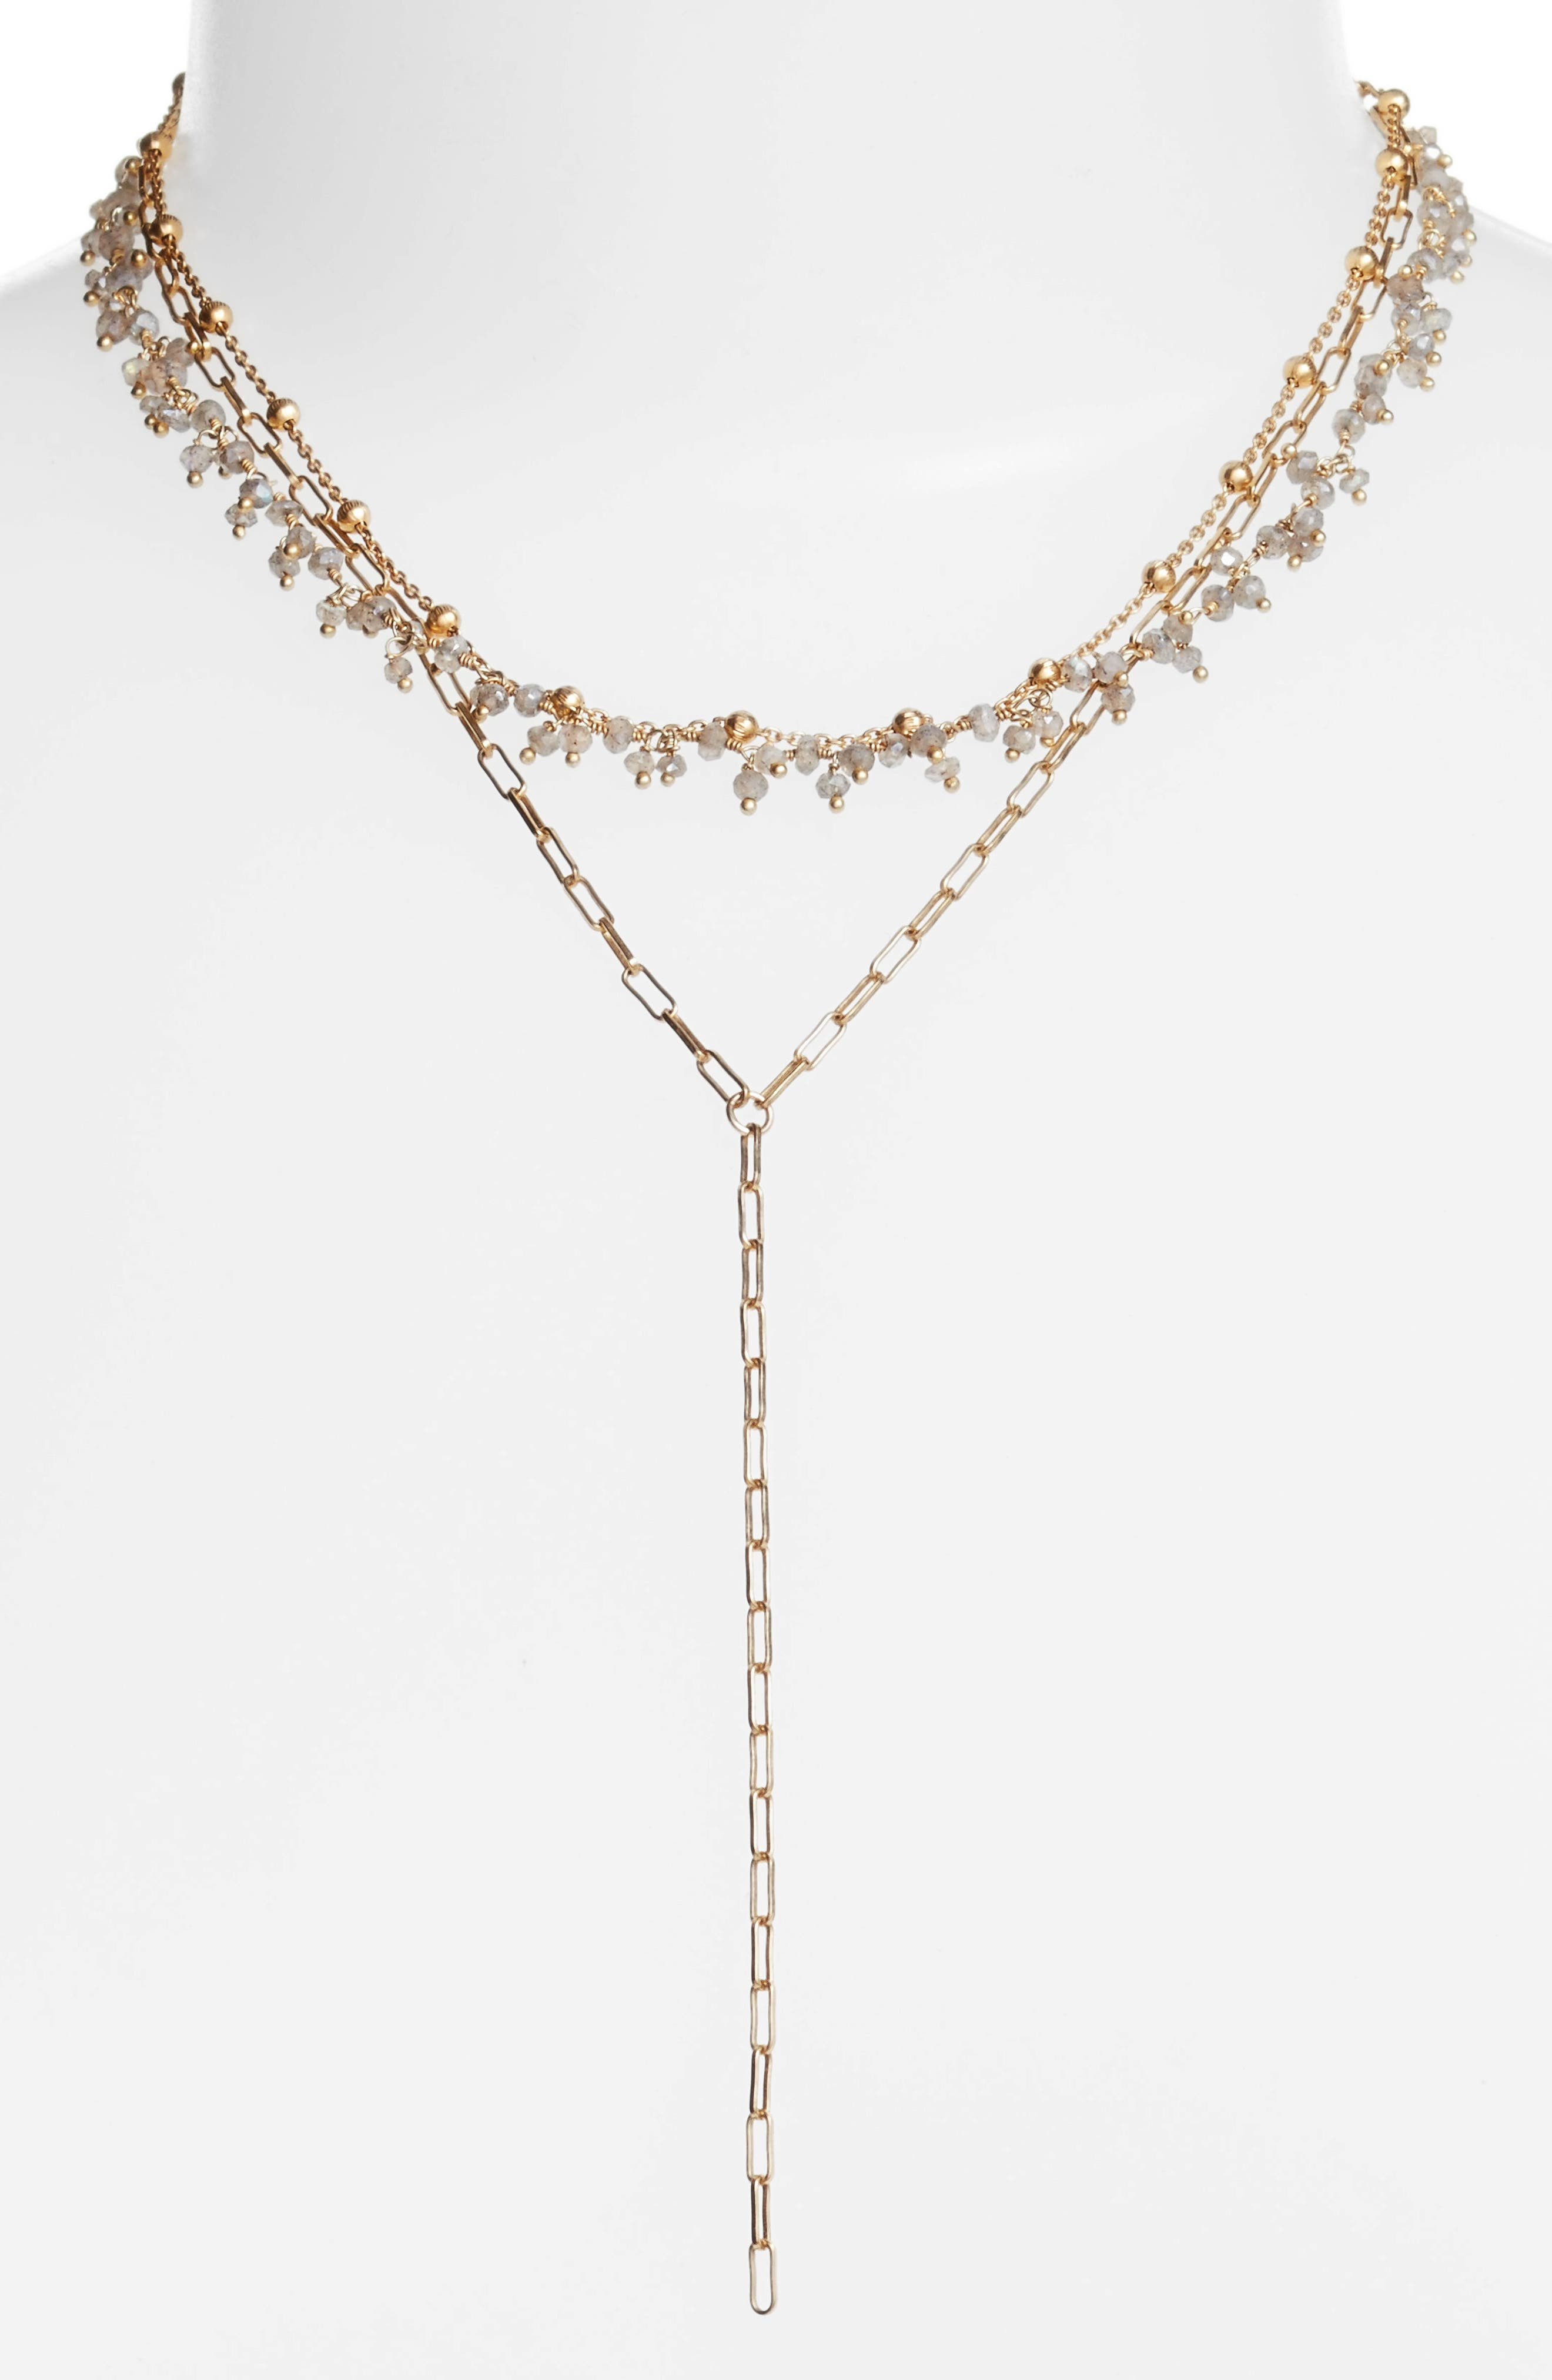 Multistrand Semiprecious Stone Necklace,                             Main thumbnail 1, color,                             Mystic Labradorite